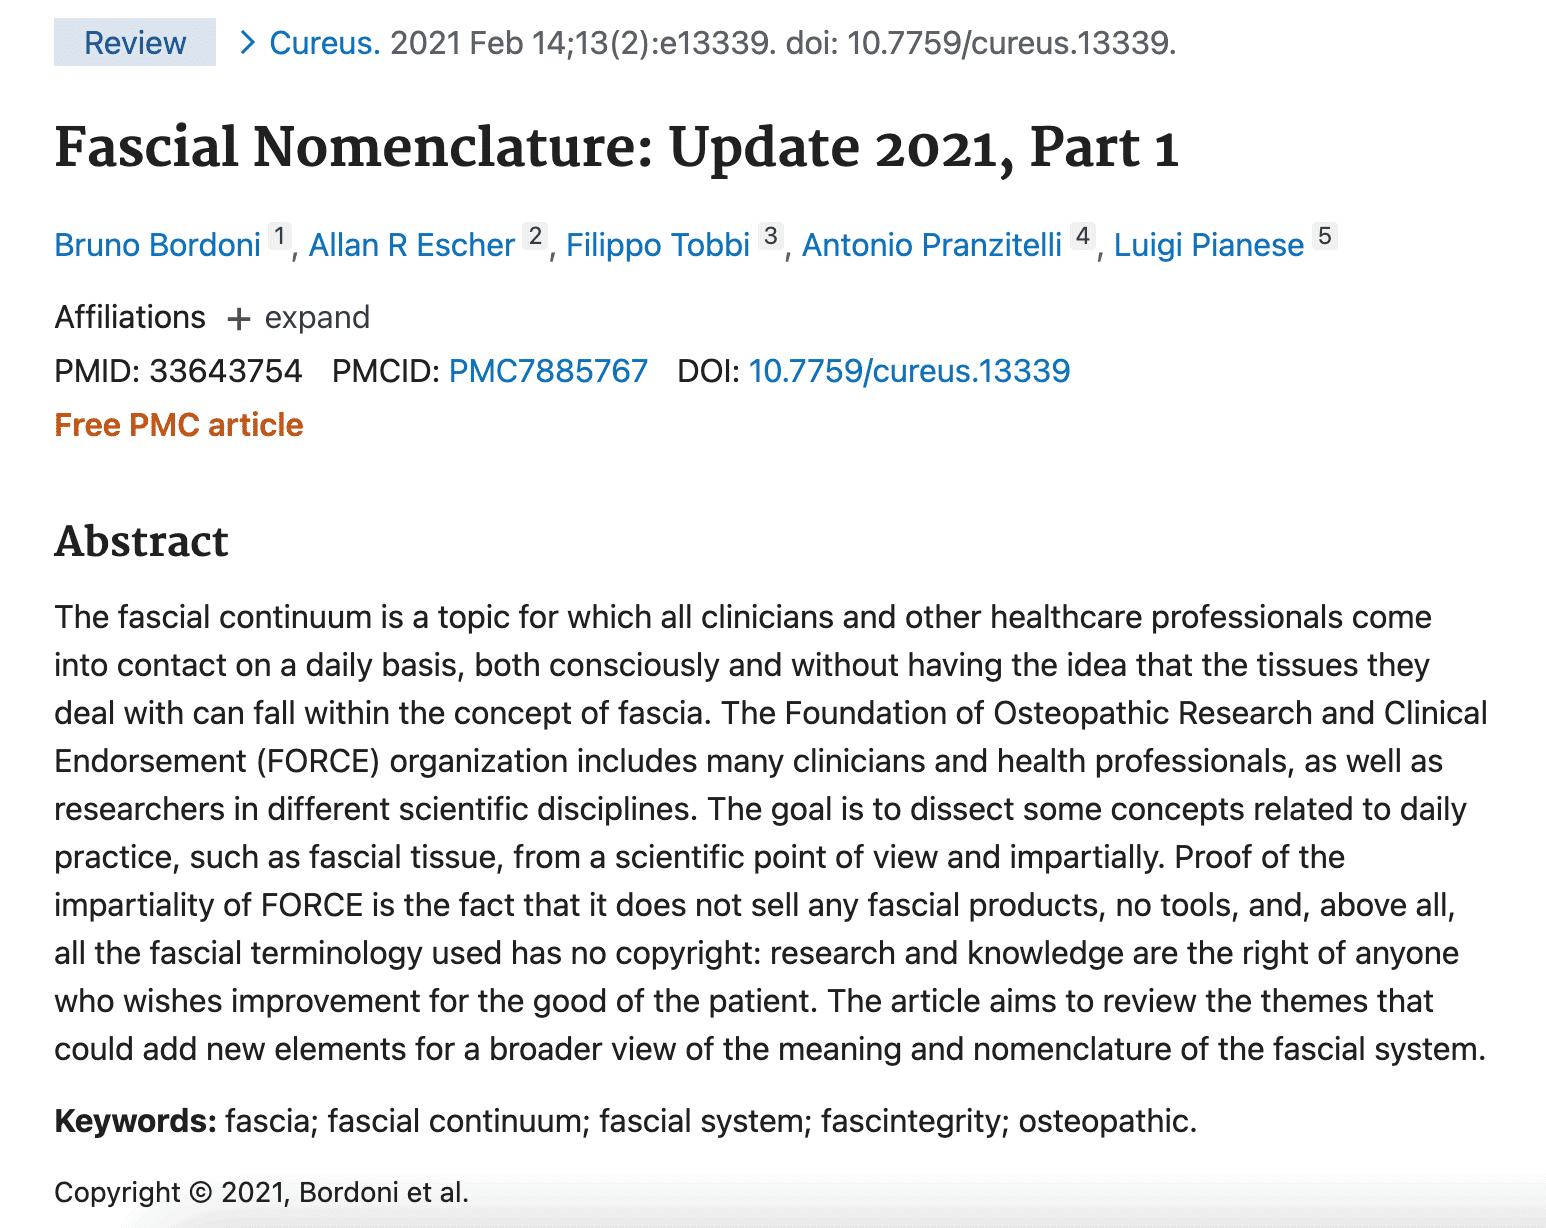 Fascial Nomenclature Update 2021 Part 1